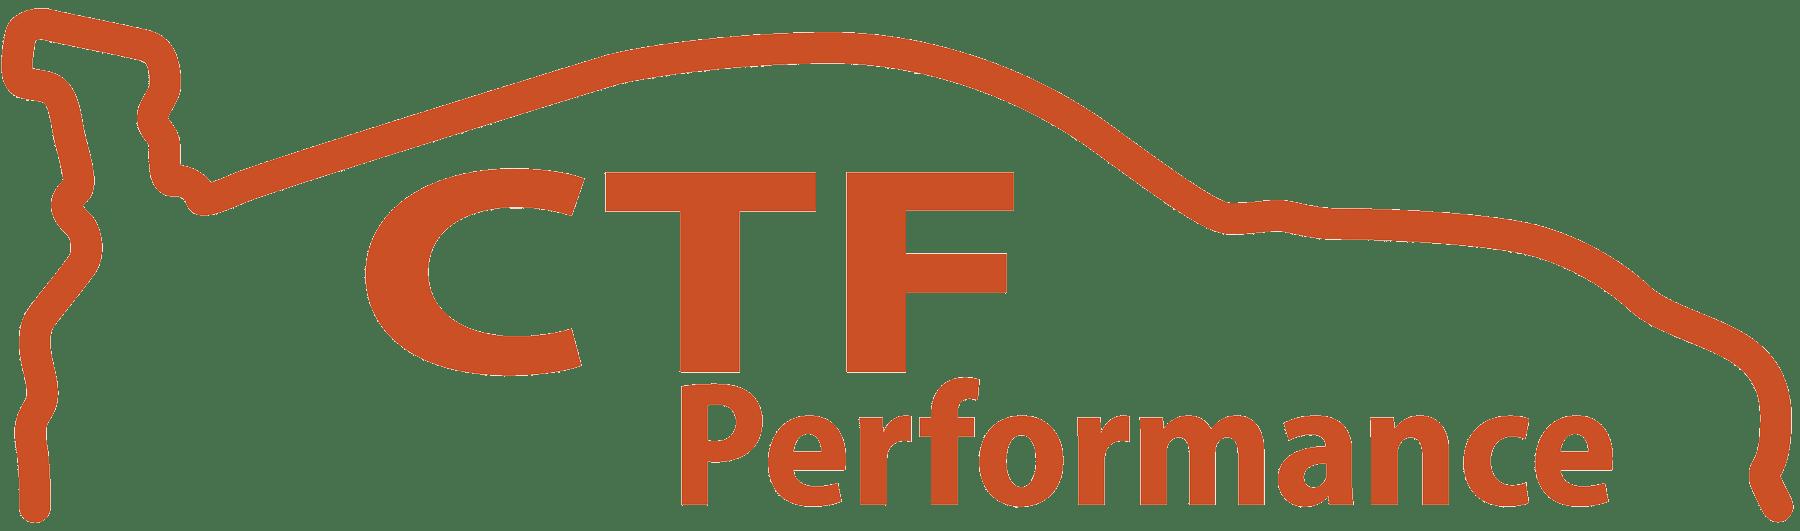 Team CTF Performance